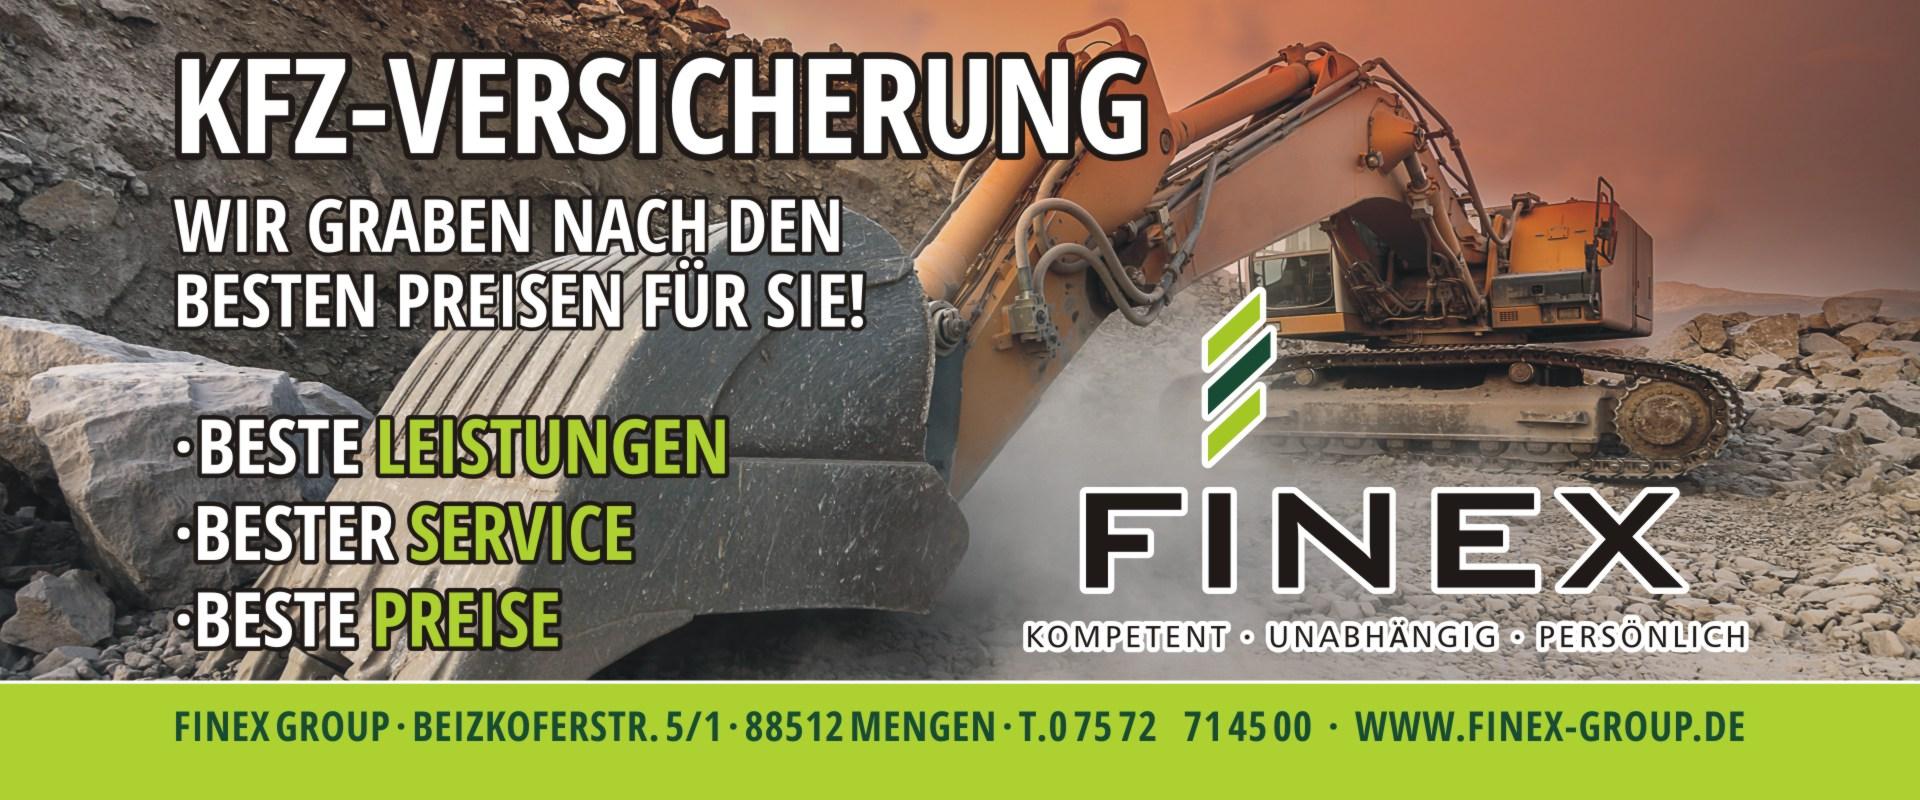 finex-mengen-01